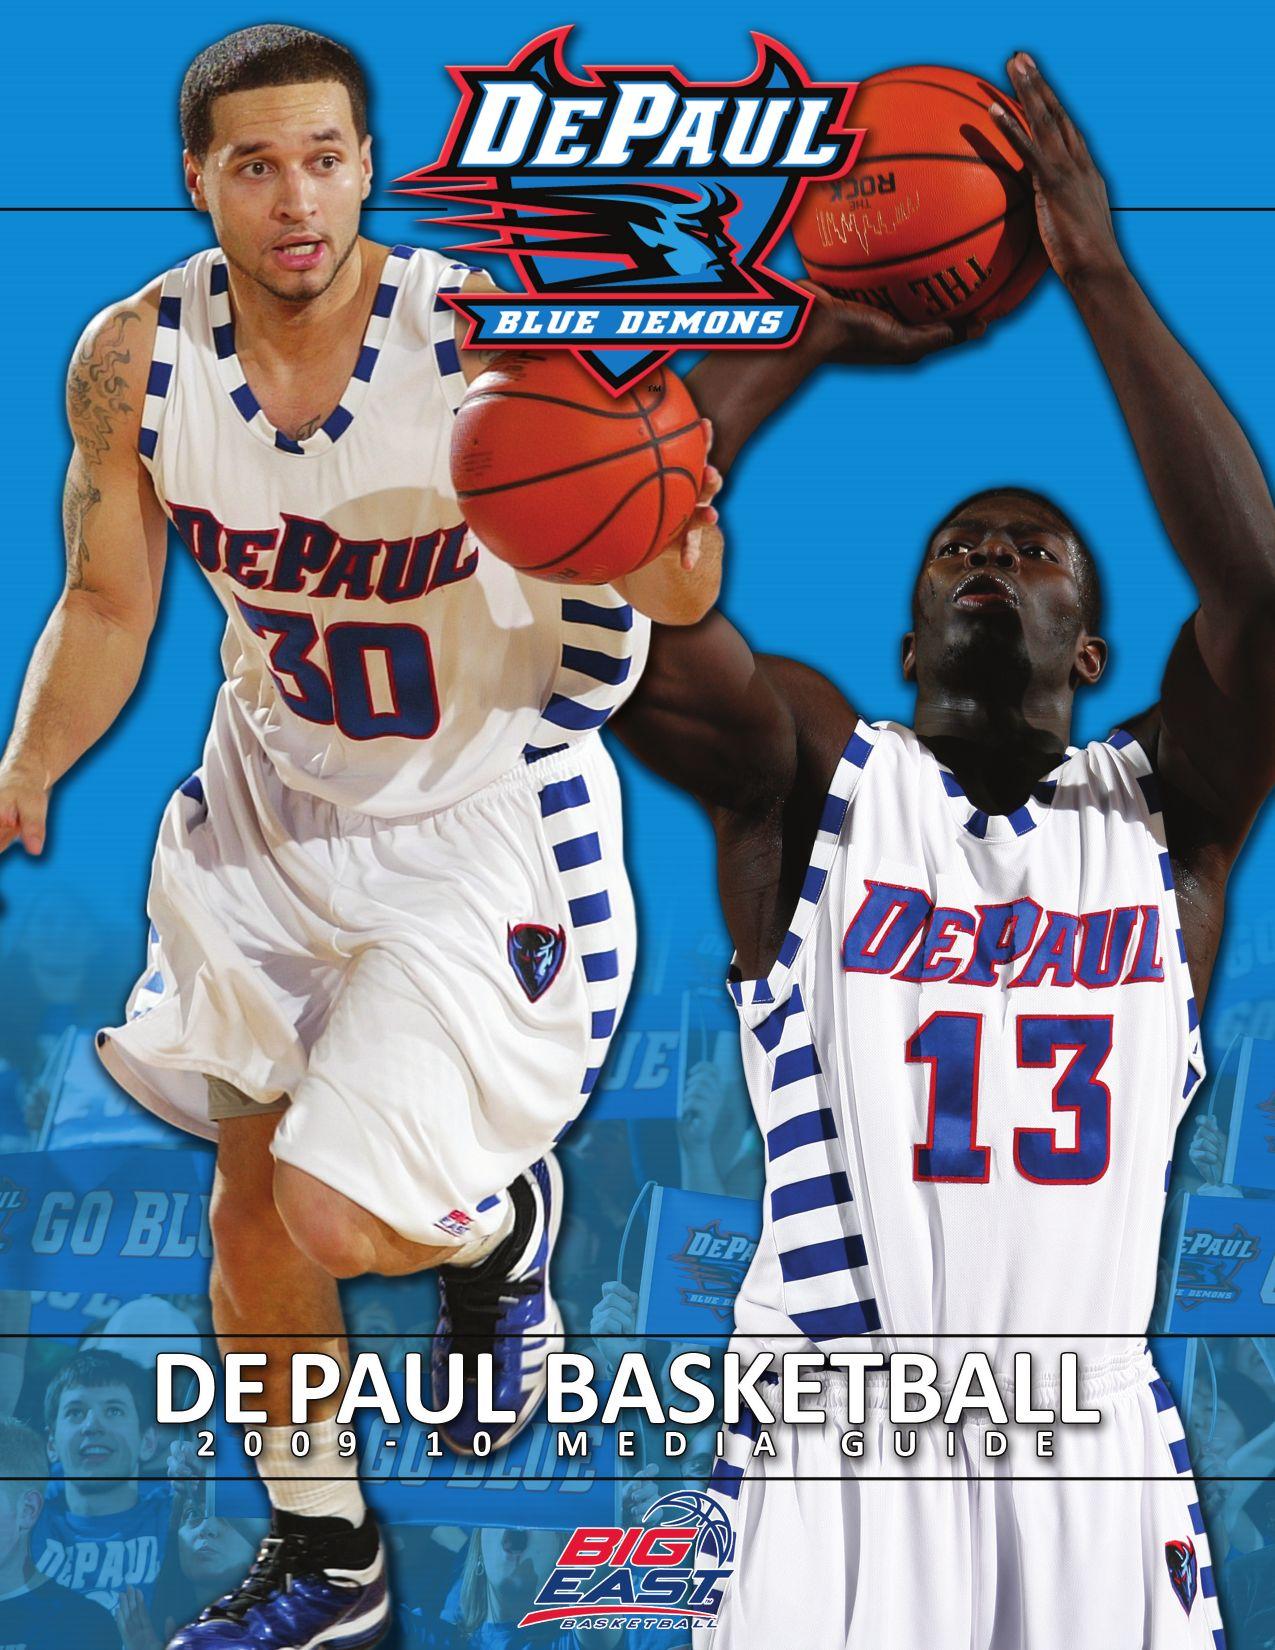 9a0446c7c995 2009-10 DePaul Men s Basketball Media Guide by DePaul Athletics - issuu